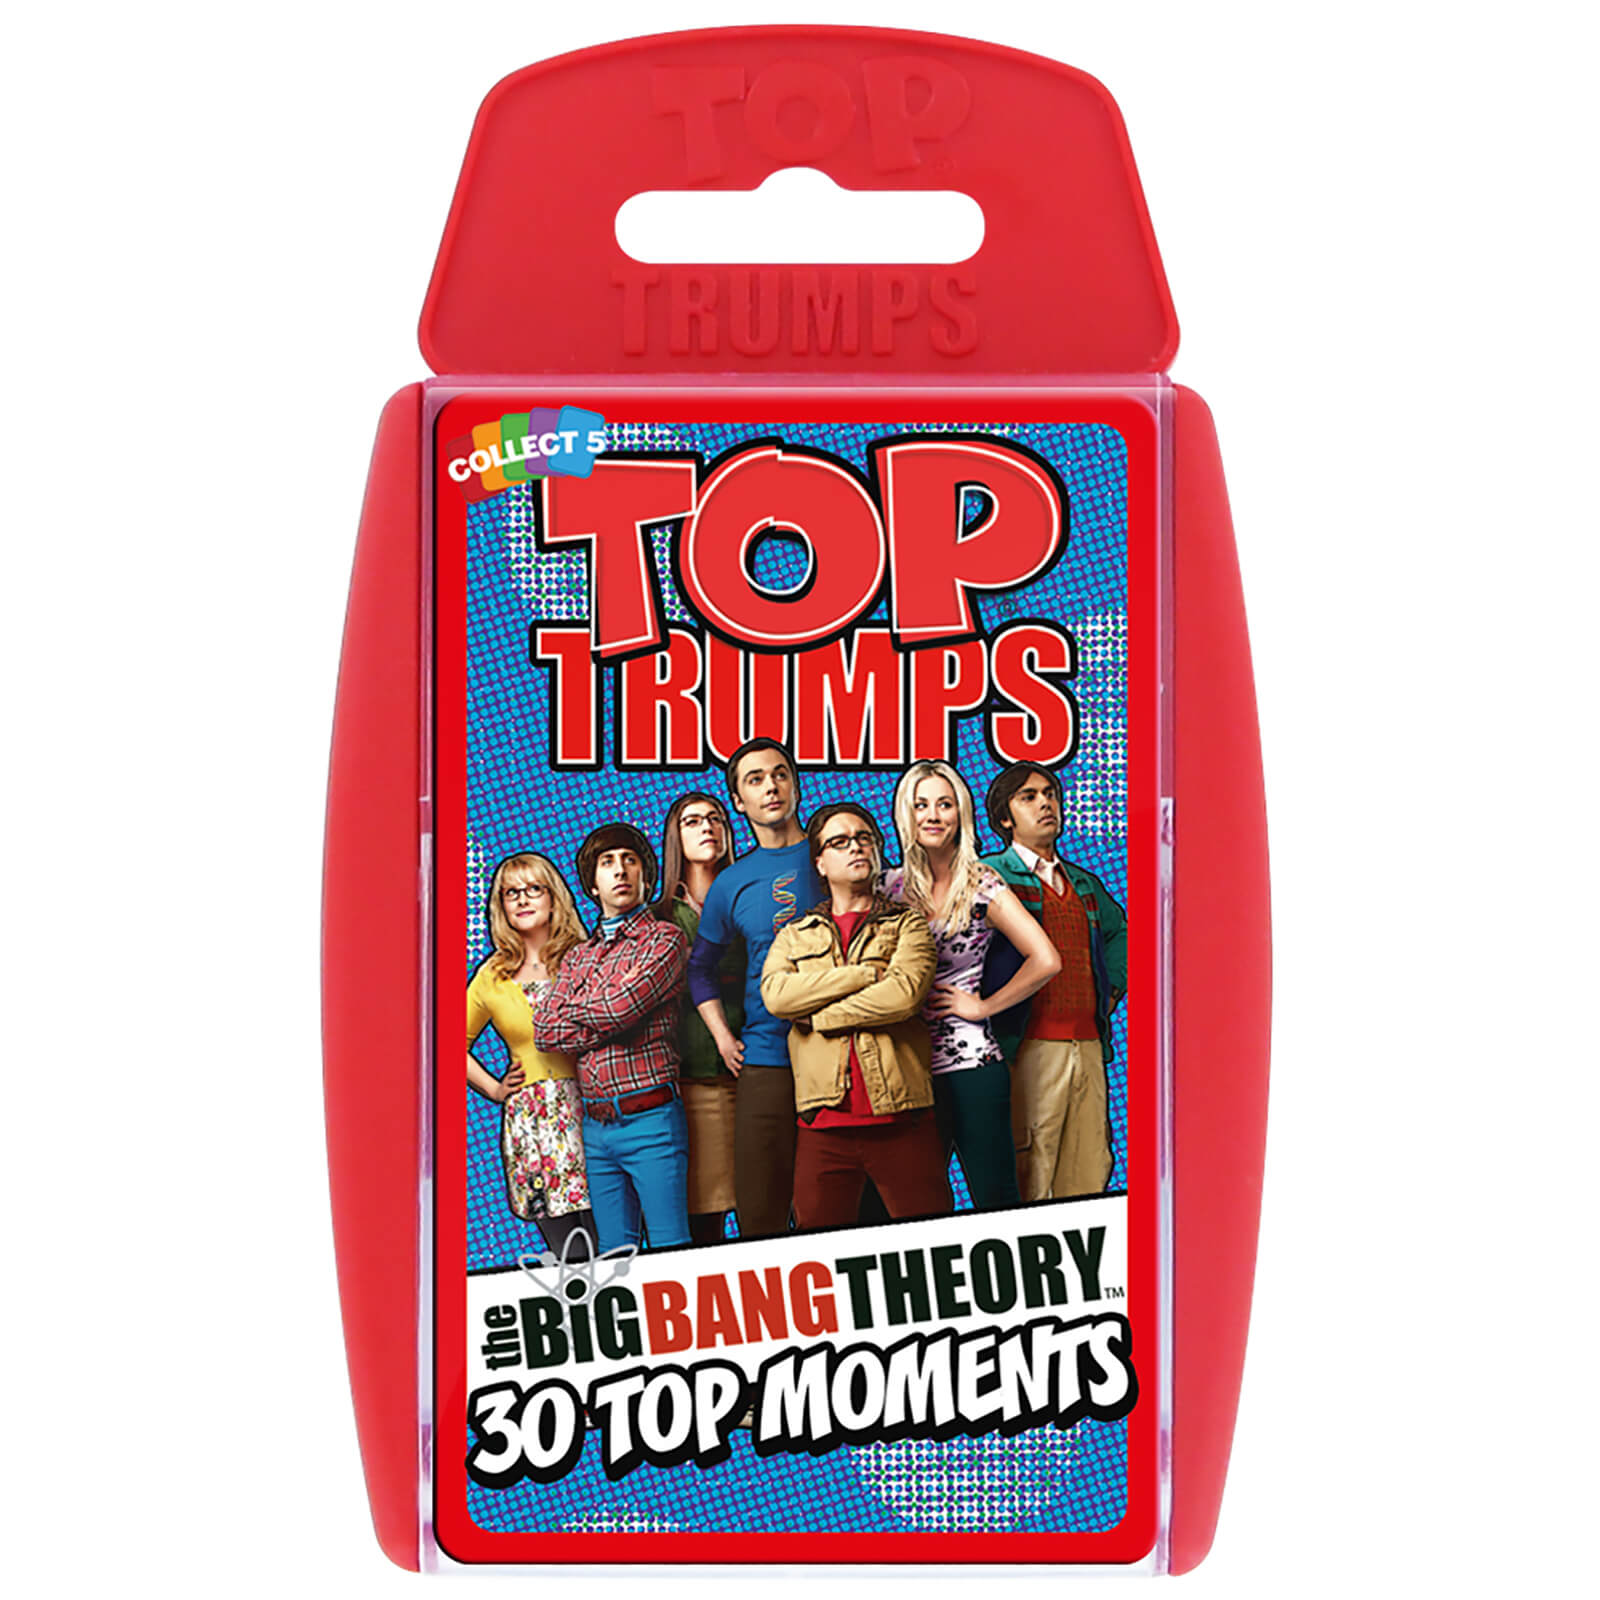 Image of Top Trumps Card Game - The Big Bang Theory Edition